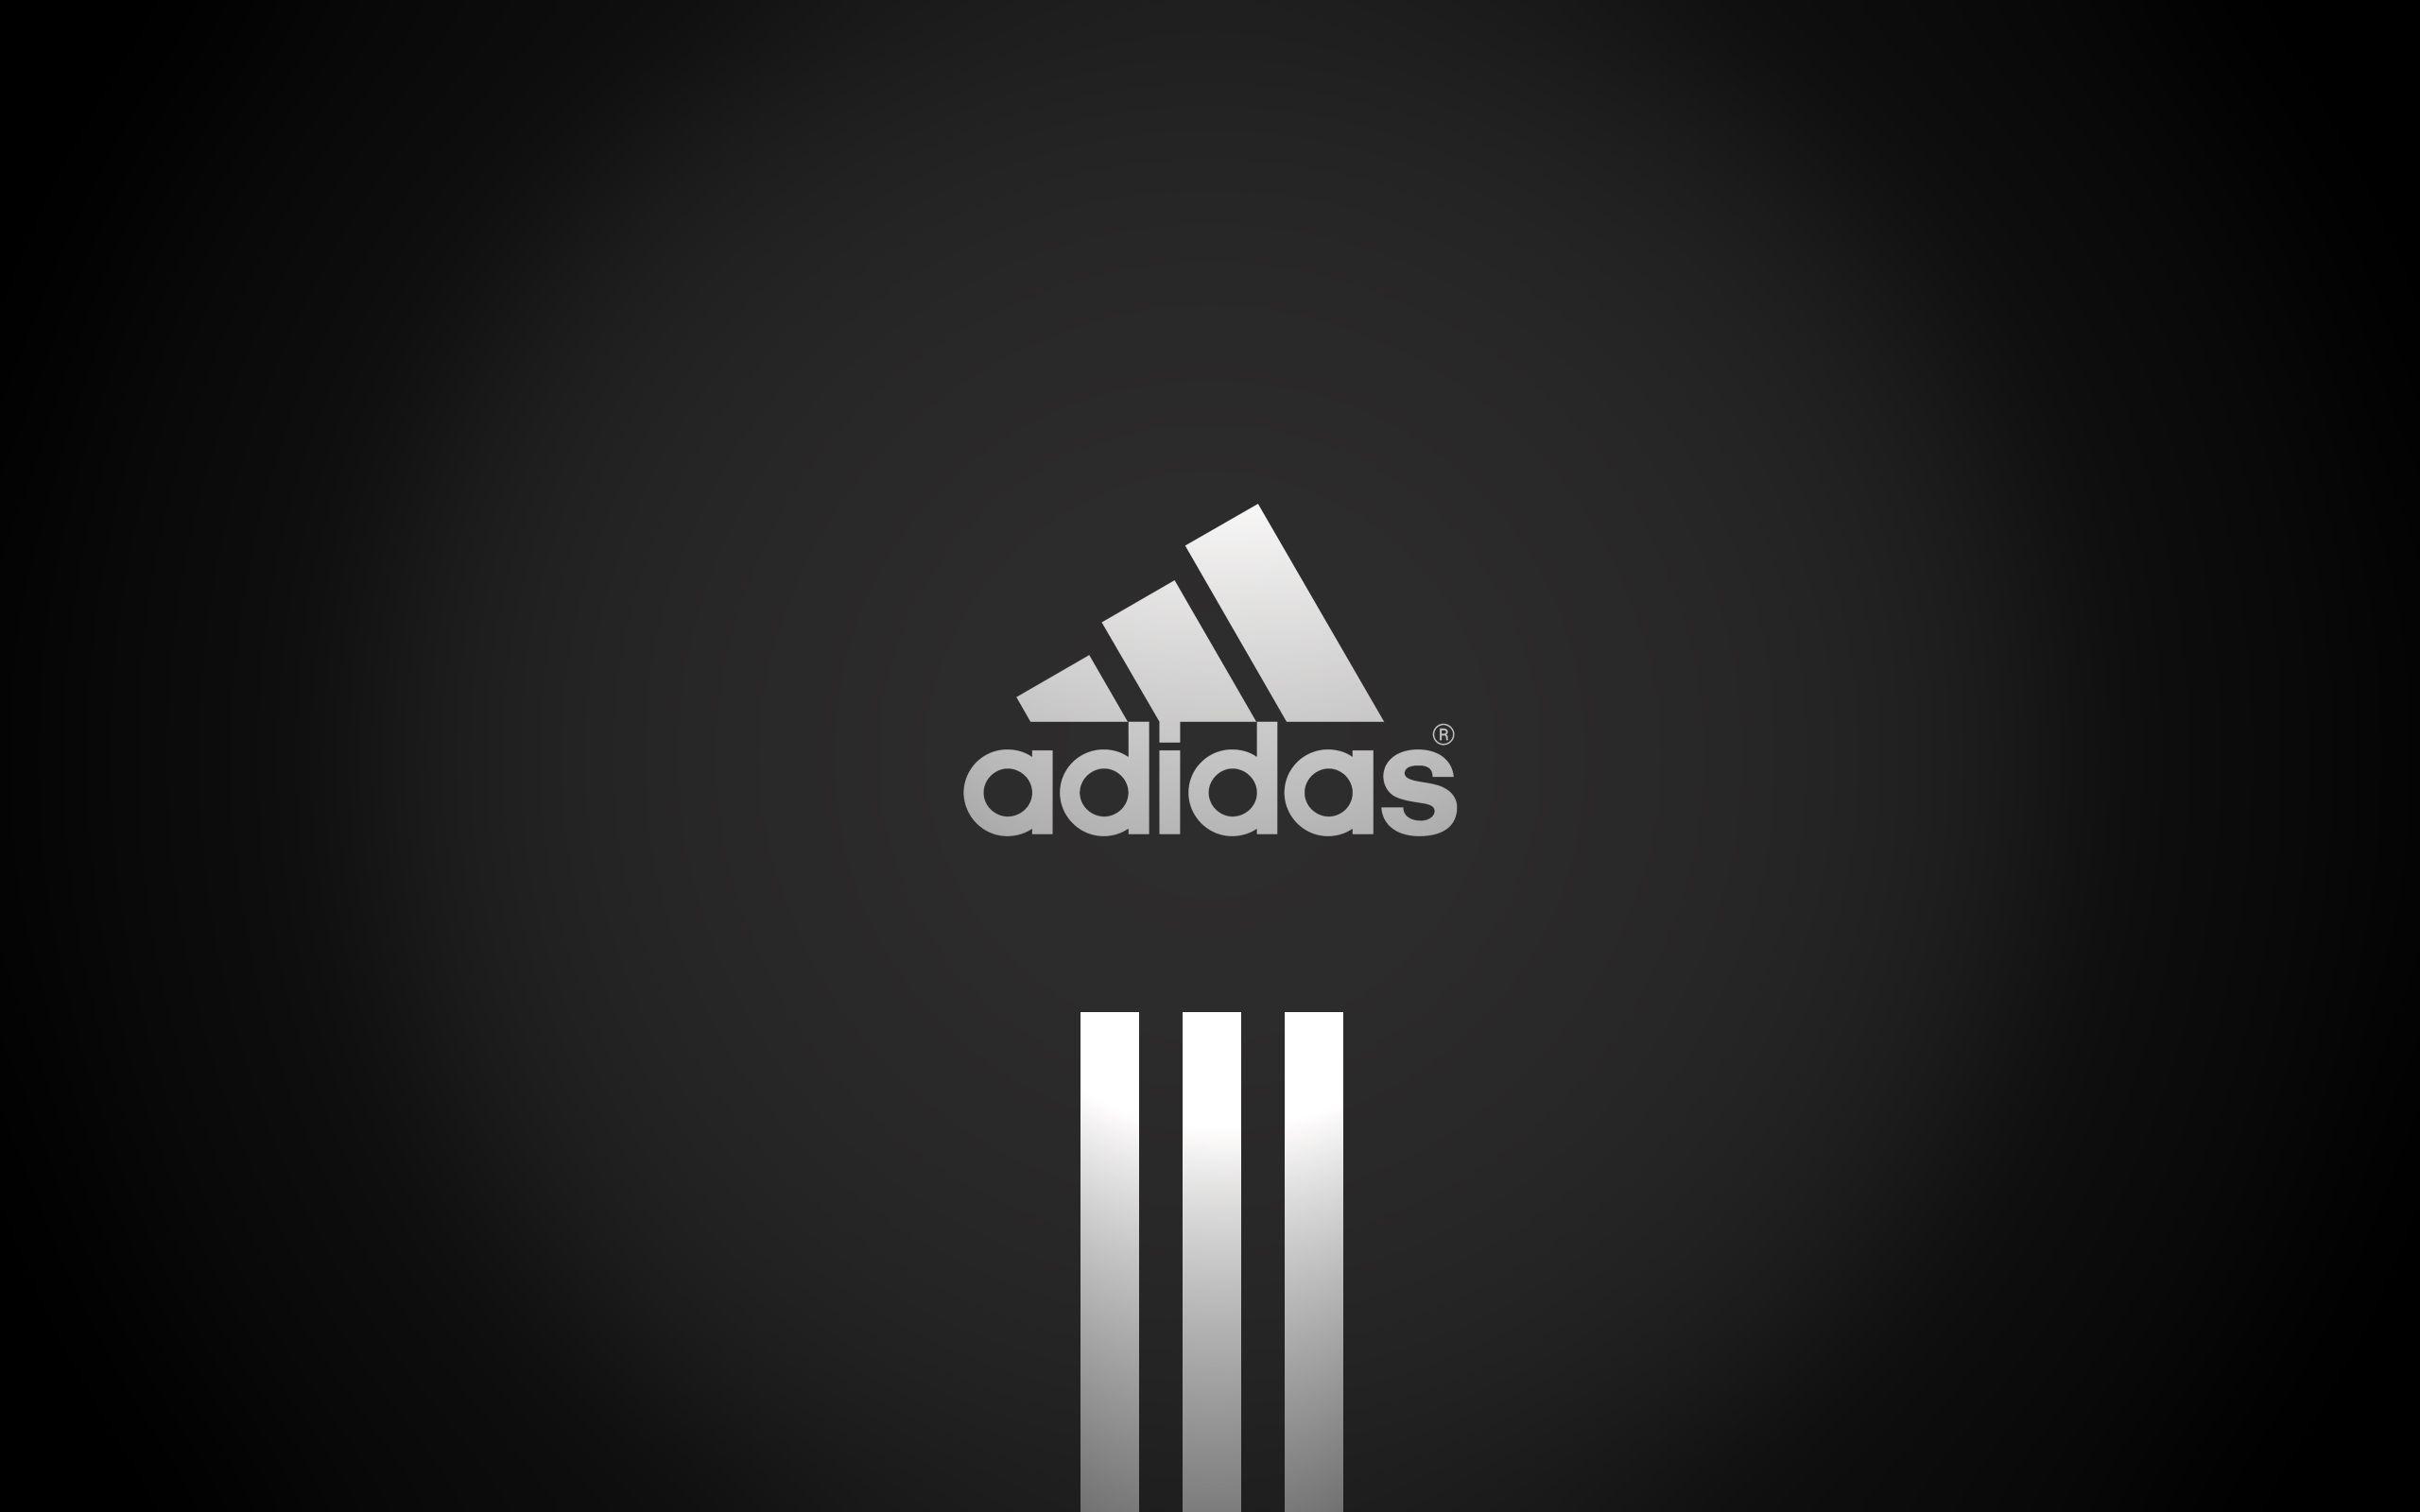 Wallpaper Logo Adidas 77 images 2560x1600